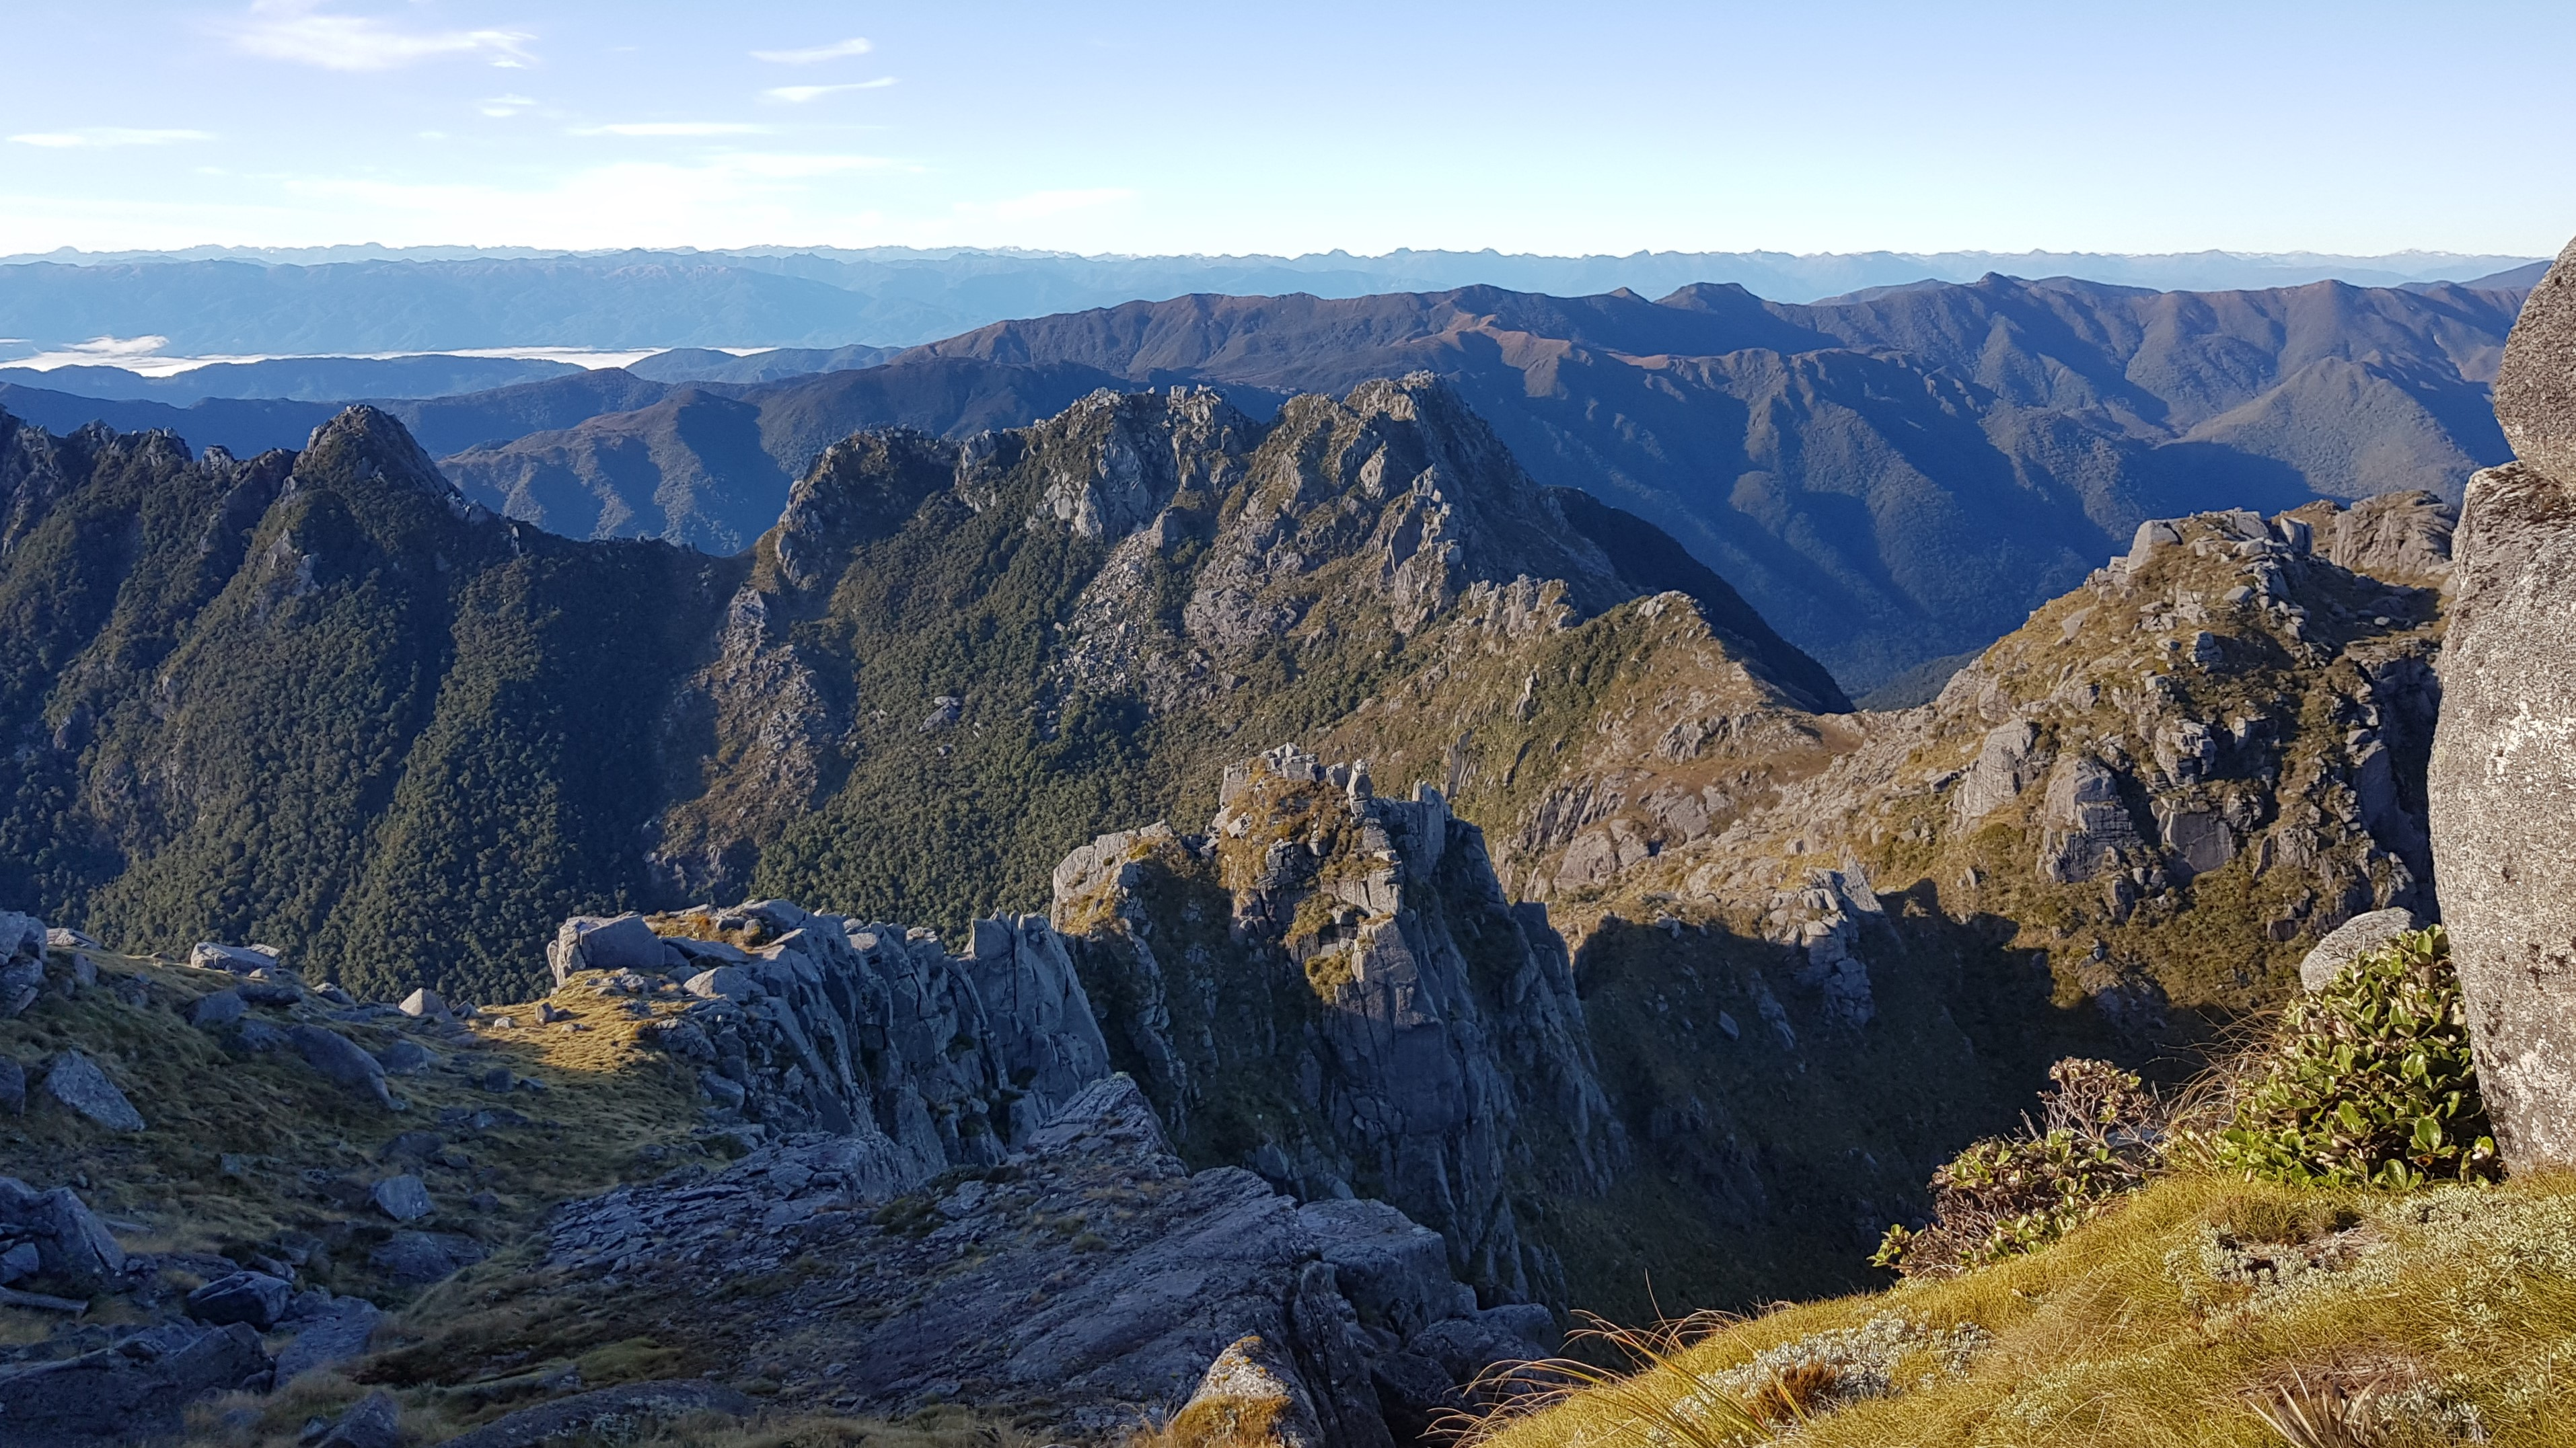 The ridge linking Buckland Peaks with the Paparoa range